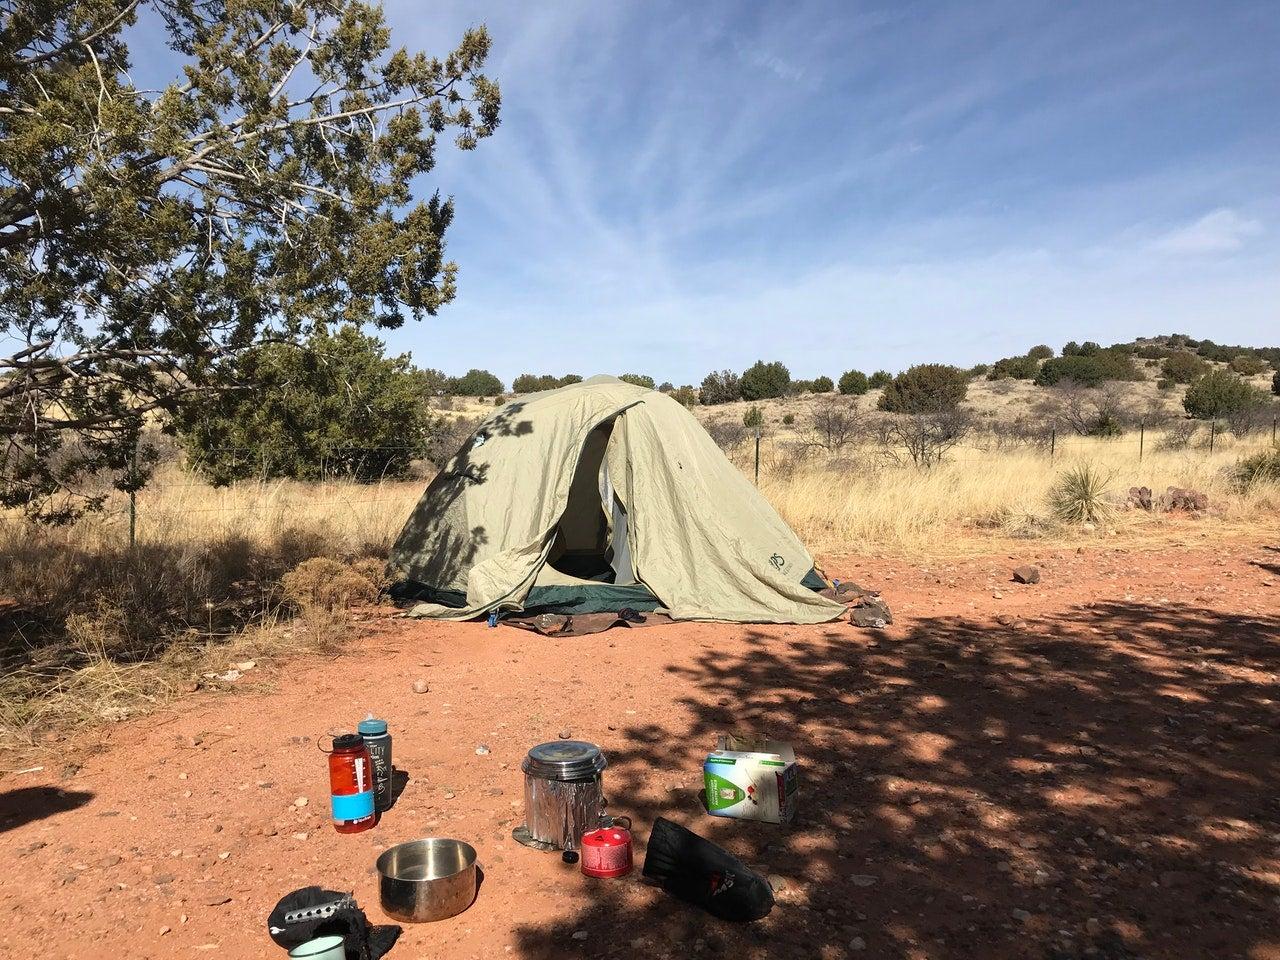 sedona camping in tent